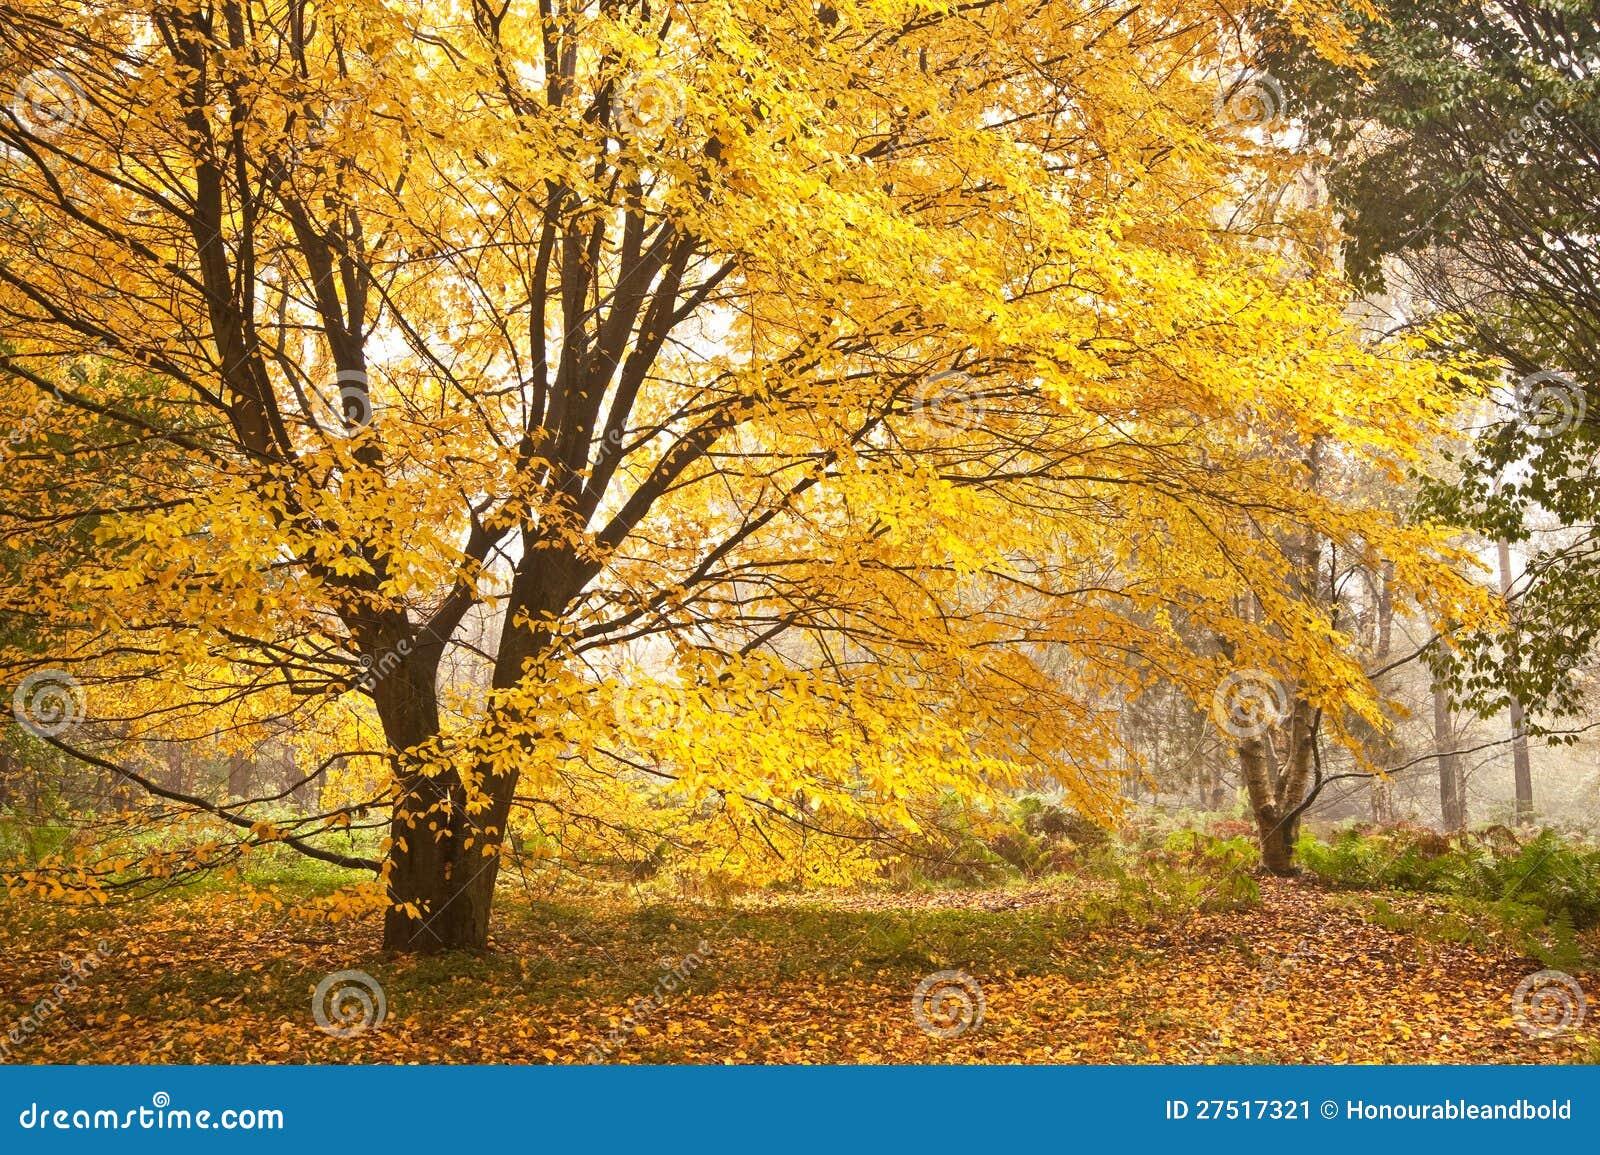 Beautiful Autumn Fall Nature Image Landscape Stock Image